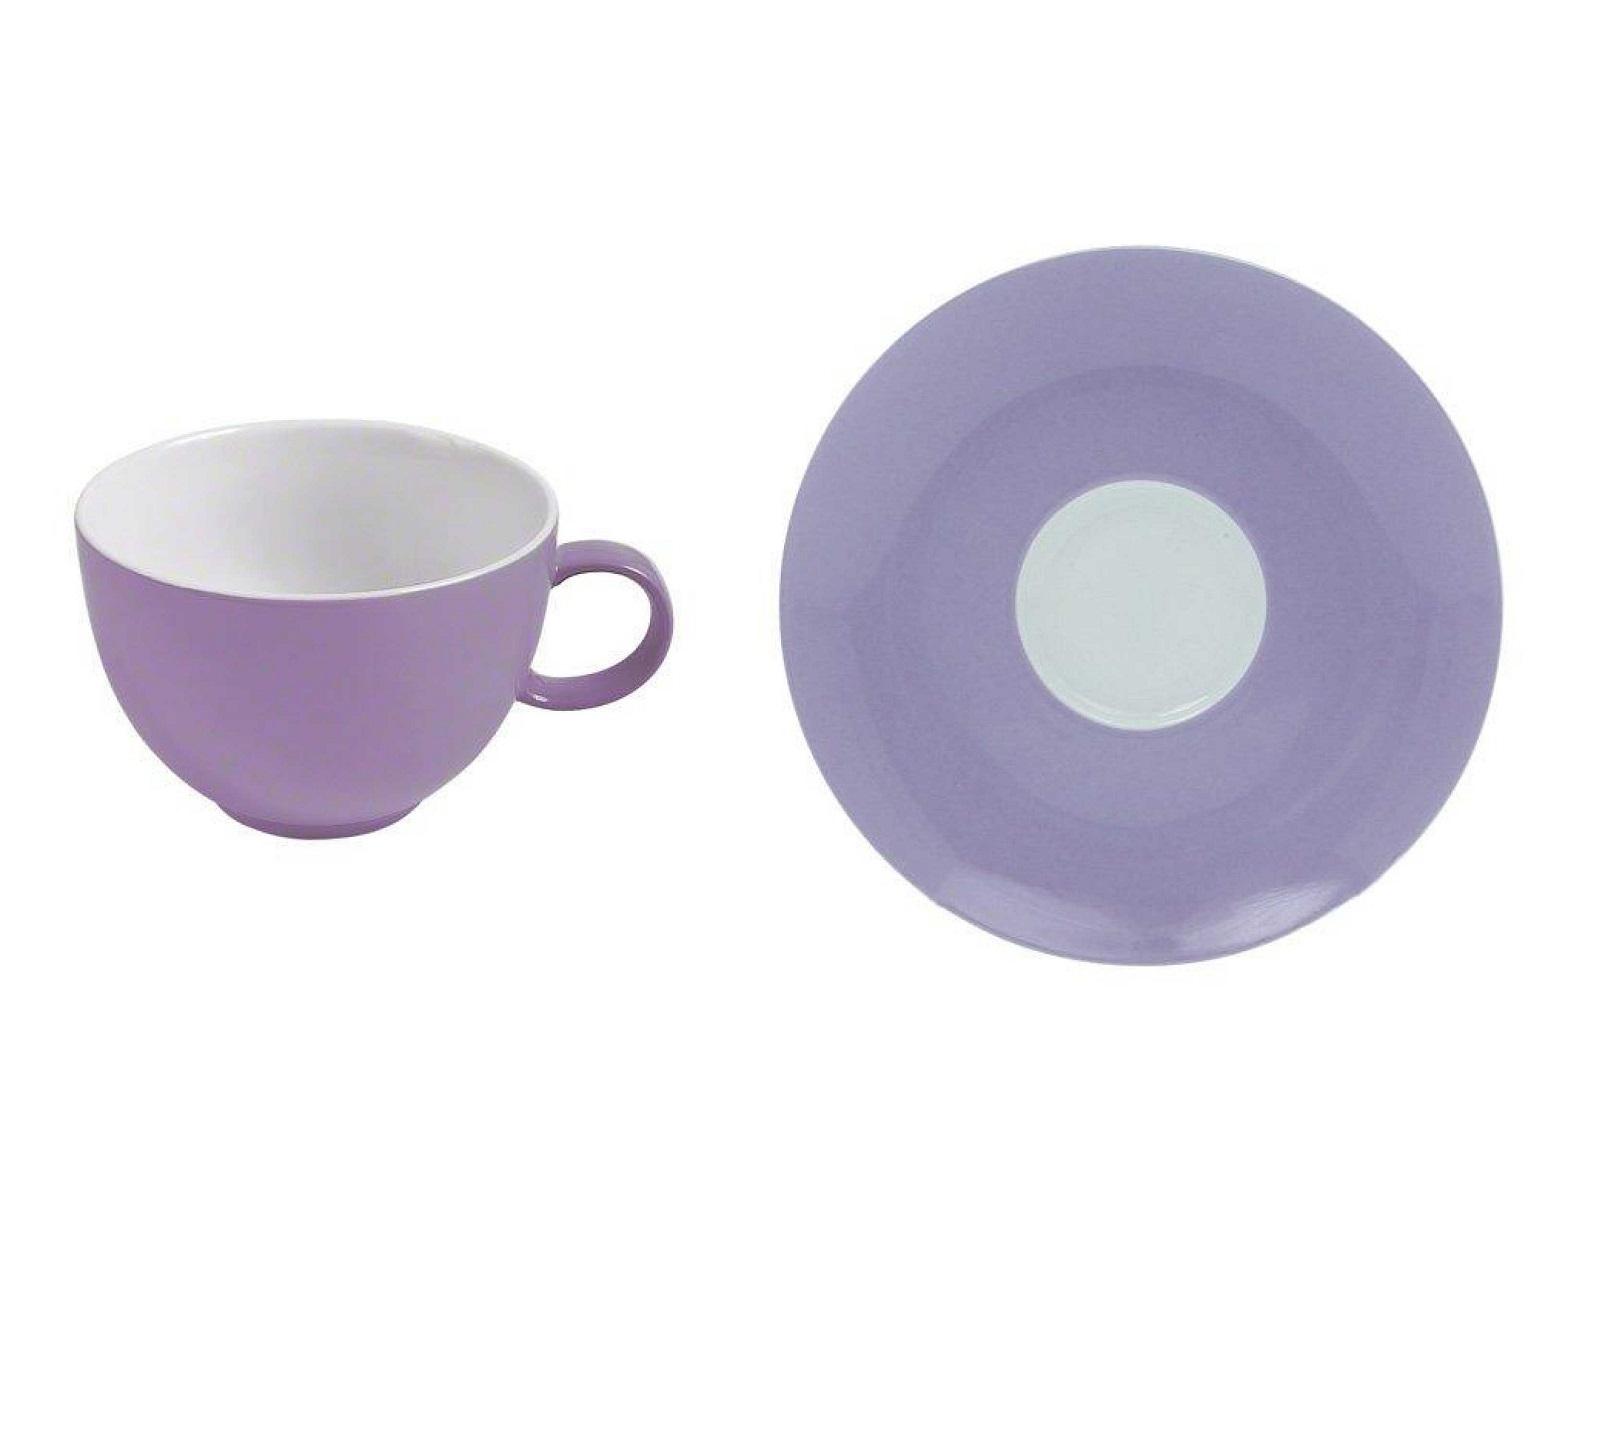 Онлайн каталог PROMENU: Набор чашка с блюдцем Rosenthal SUNNY DAY, объем 0,2 л, фиолетовый, 2 предмета Rosenthal 10850-408531-14640